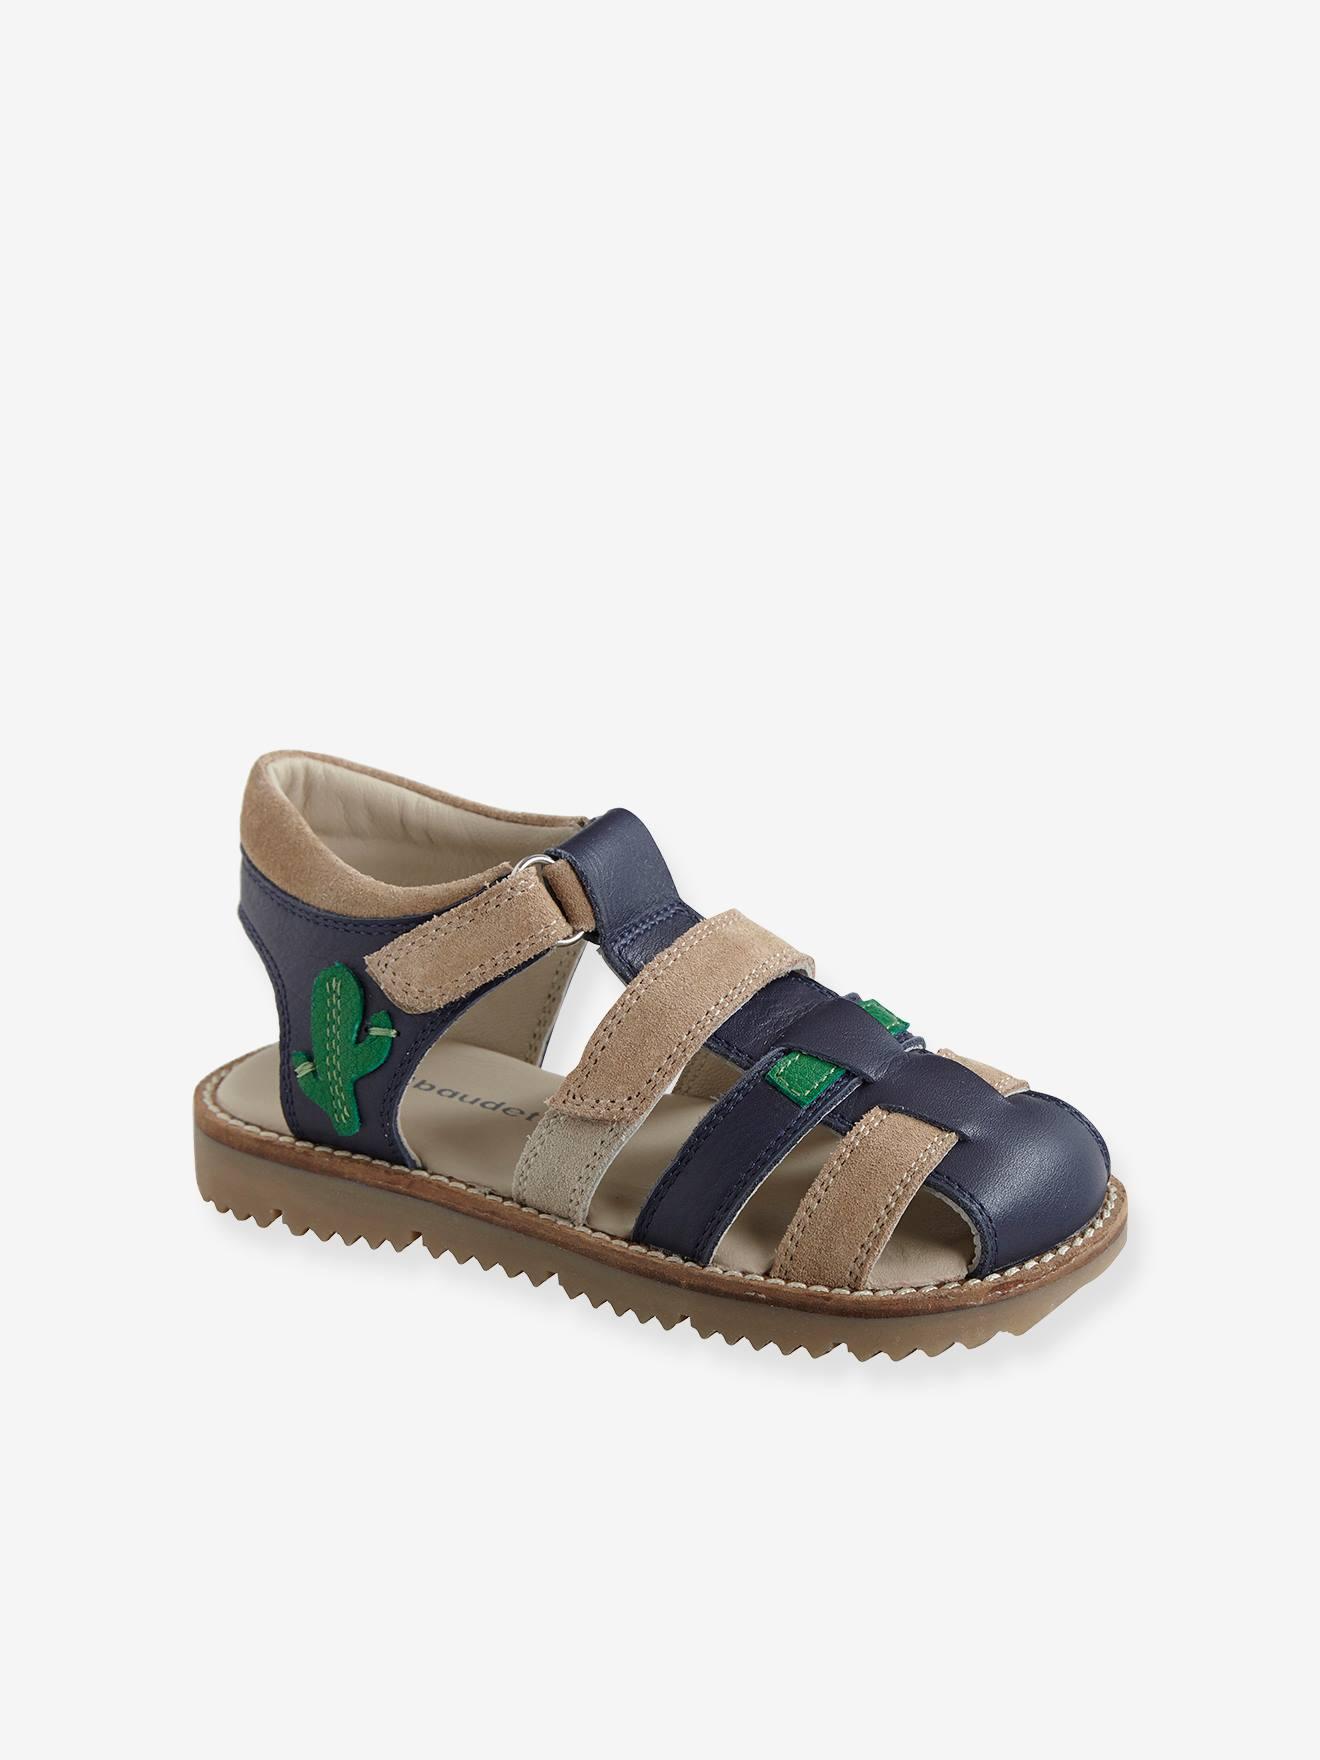 Blanc Garçons Enfant Garçon Chaussures Pour Sandales Vertbaudet pqUzMVSG